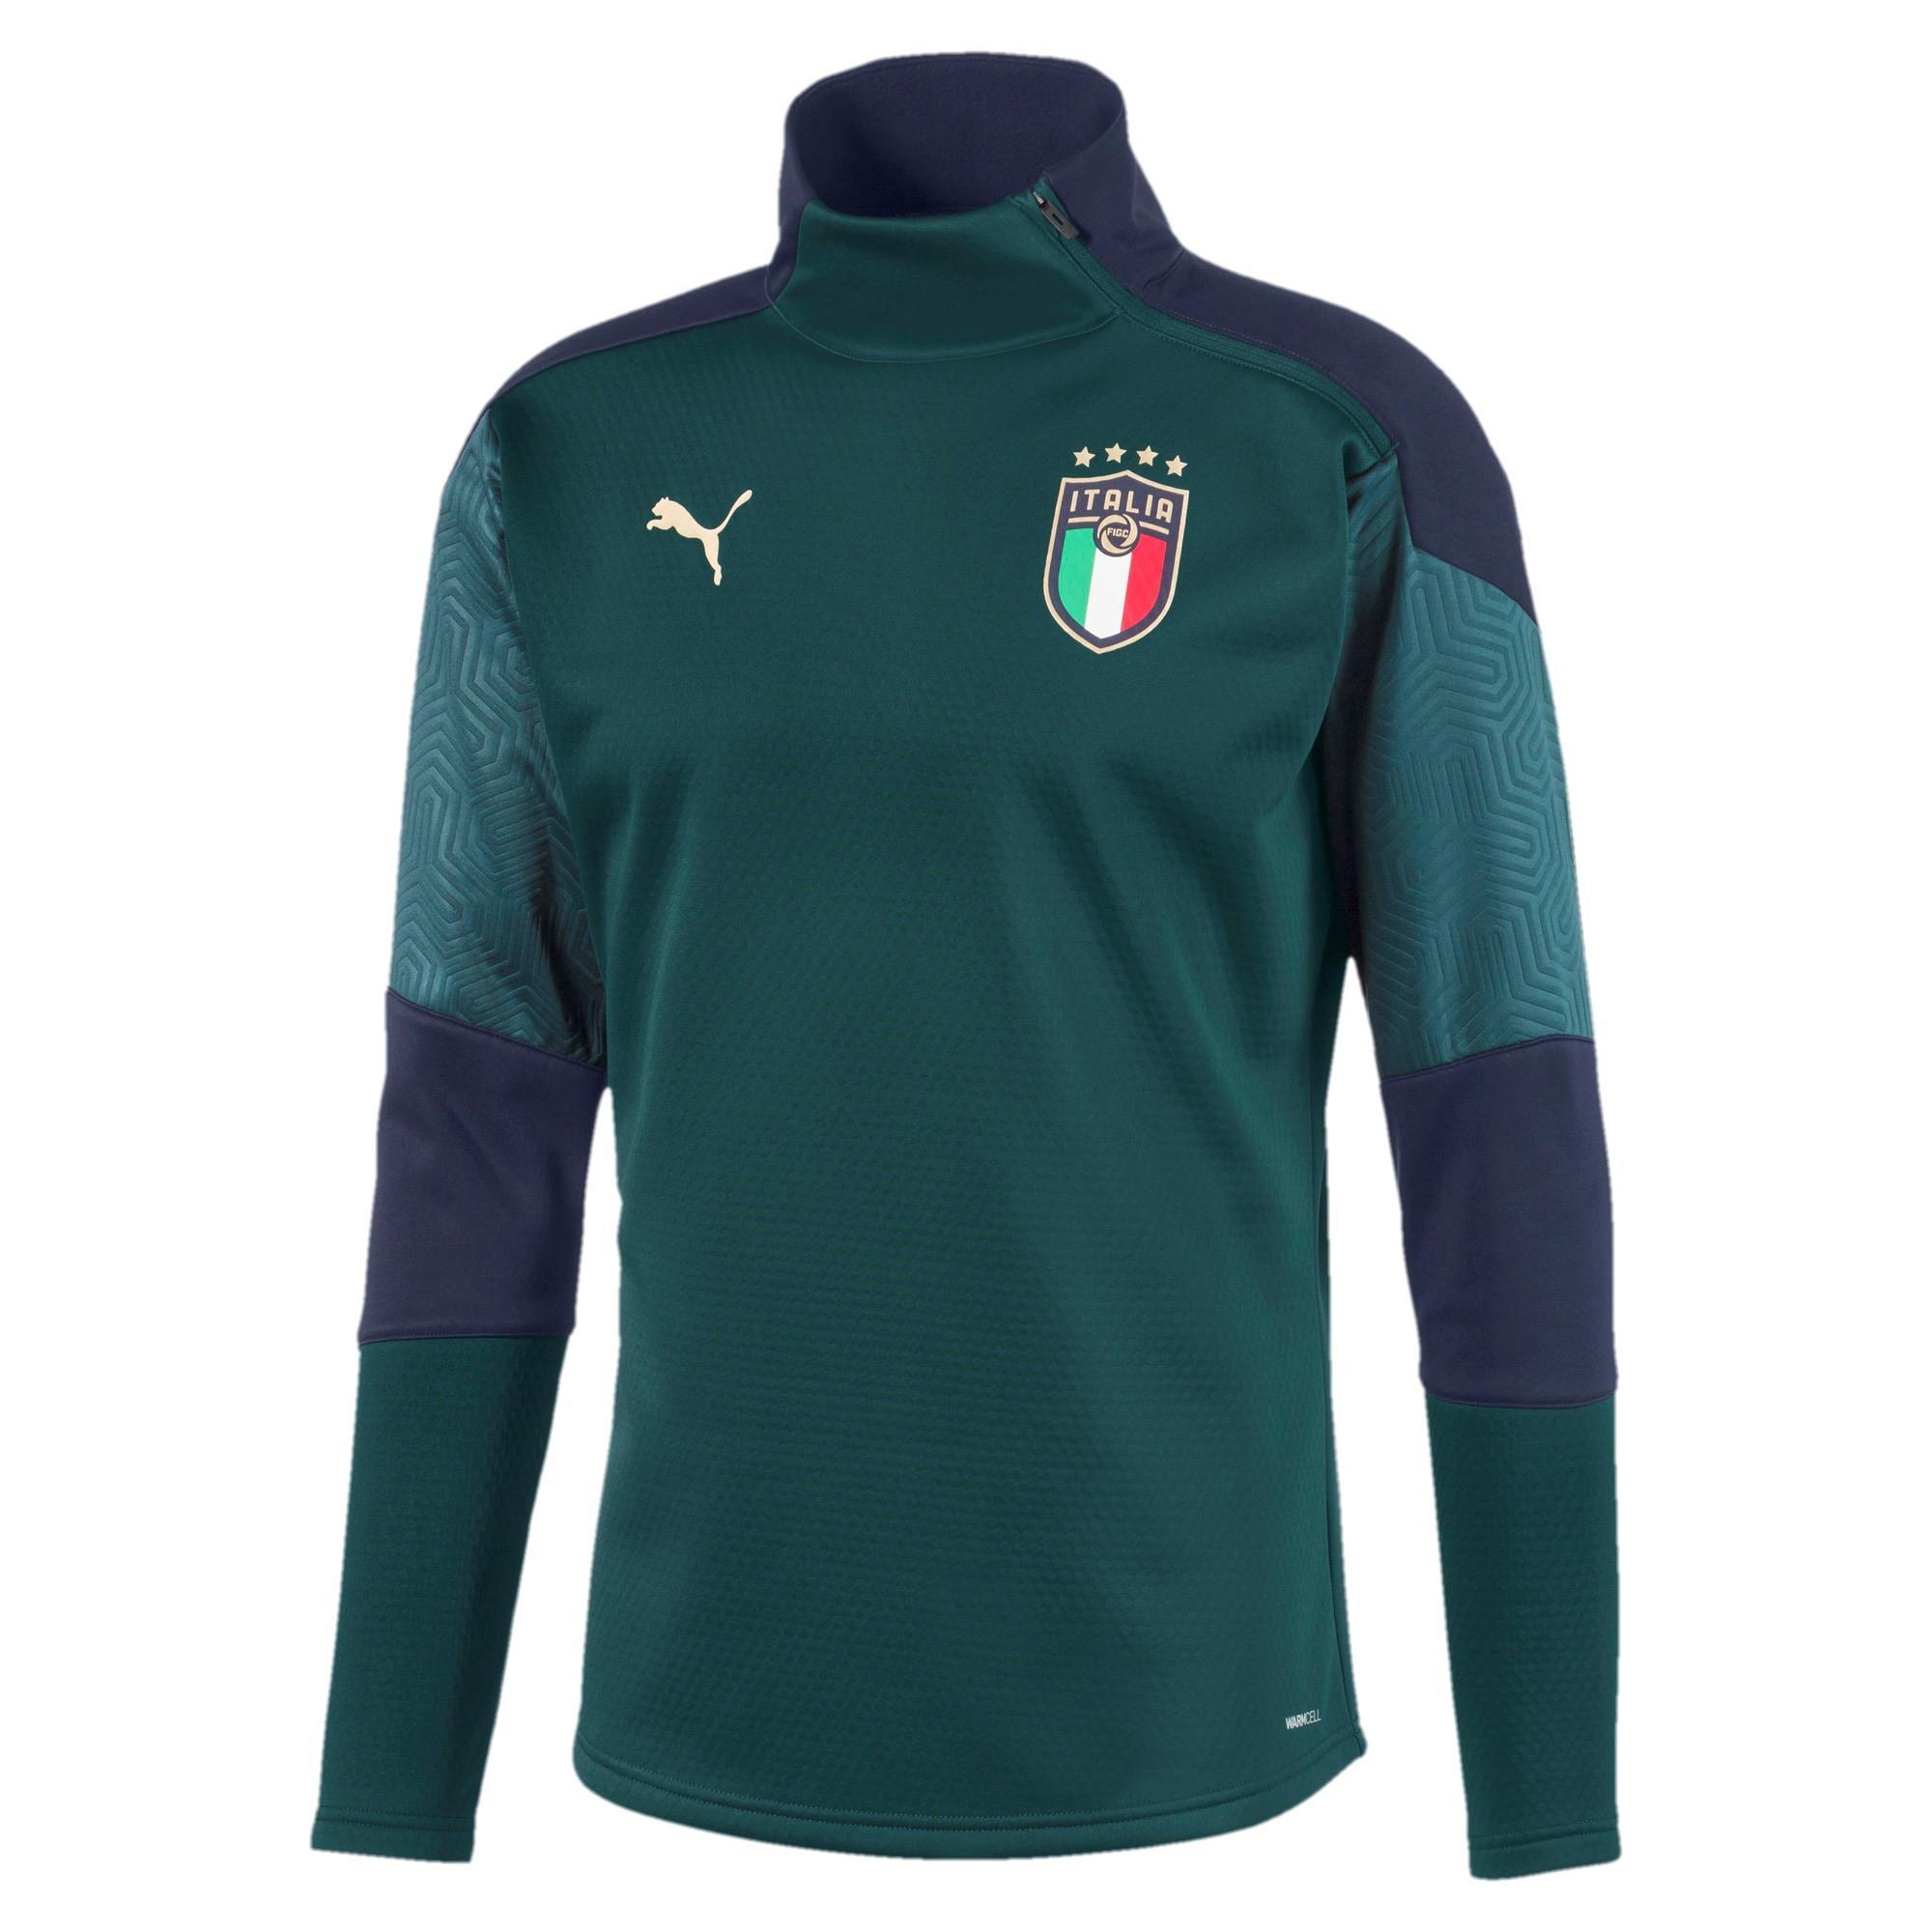 Puma Pile Allenamento Italia